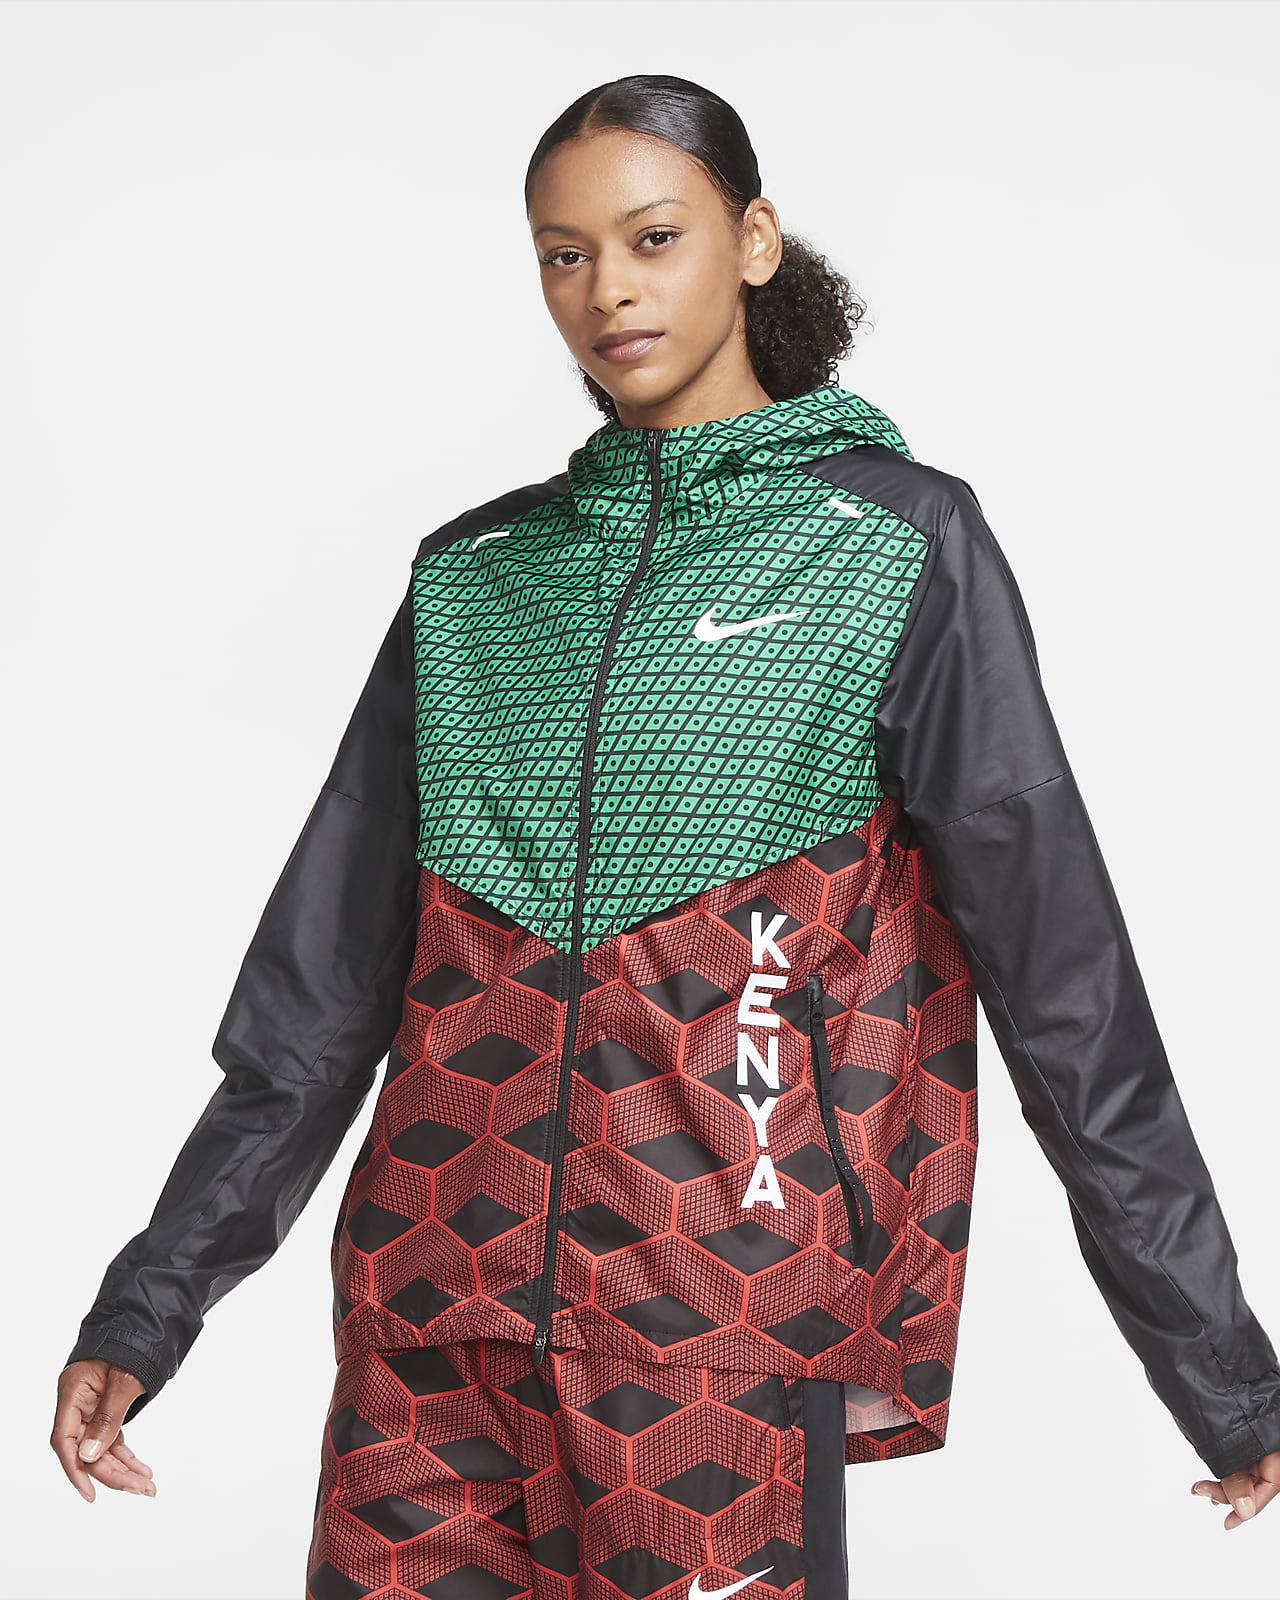 Chamarra de running Nike Team Kenya Shieldrunner